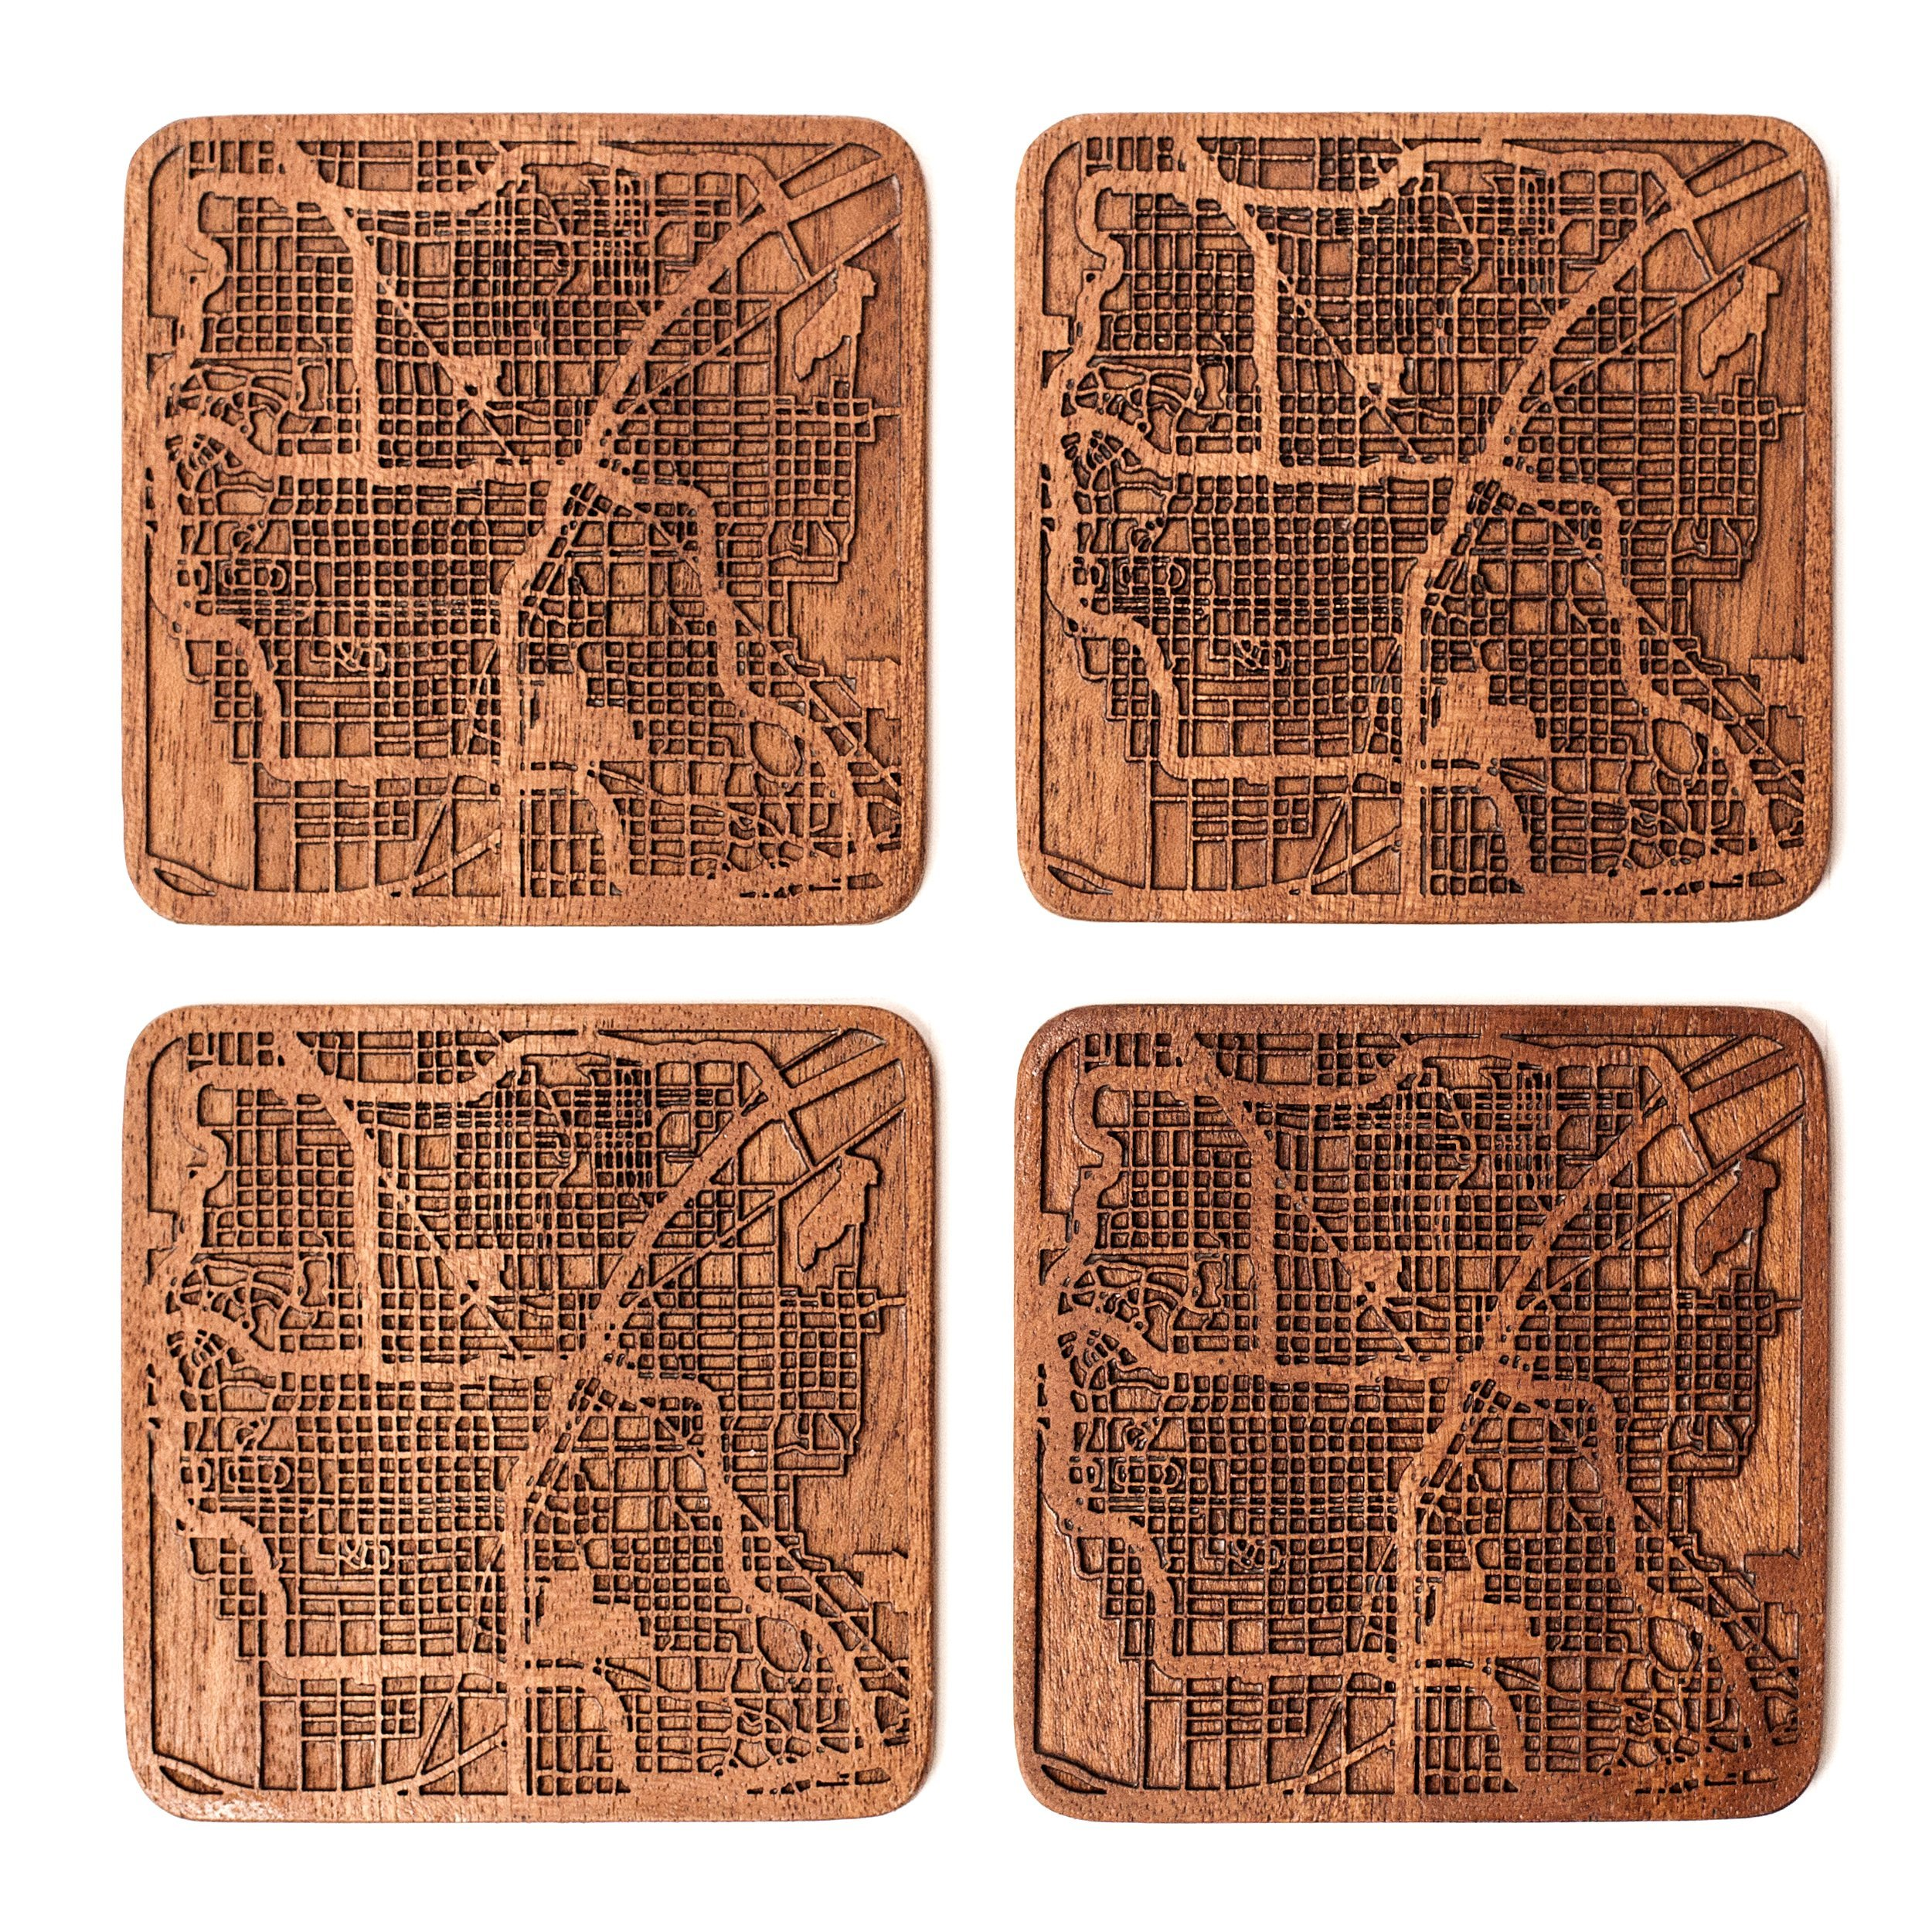 Las Vegas Map Coaster by O3 Design Studio, Set Of